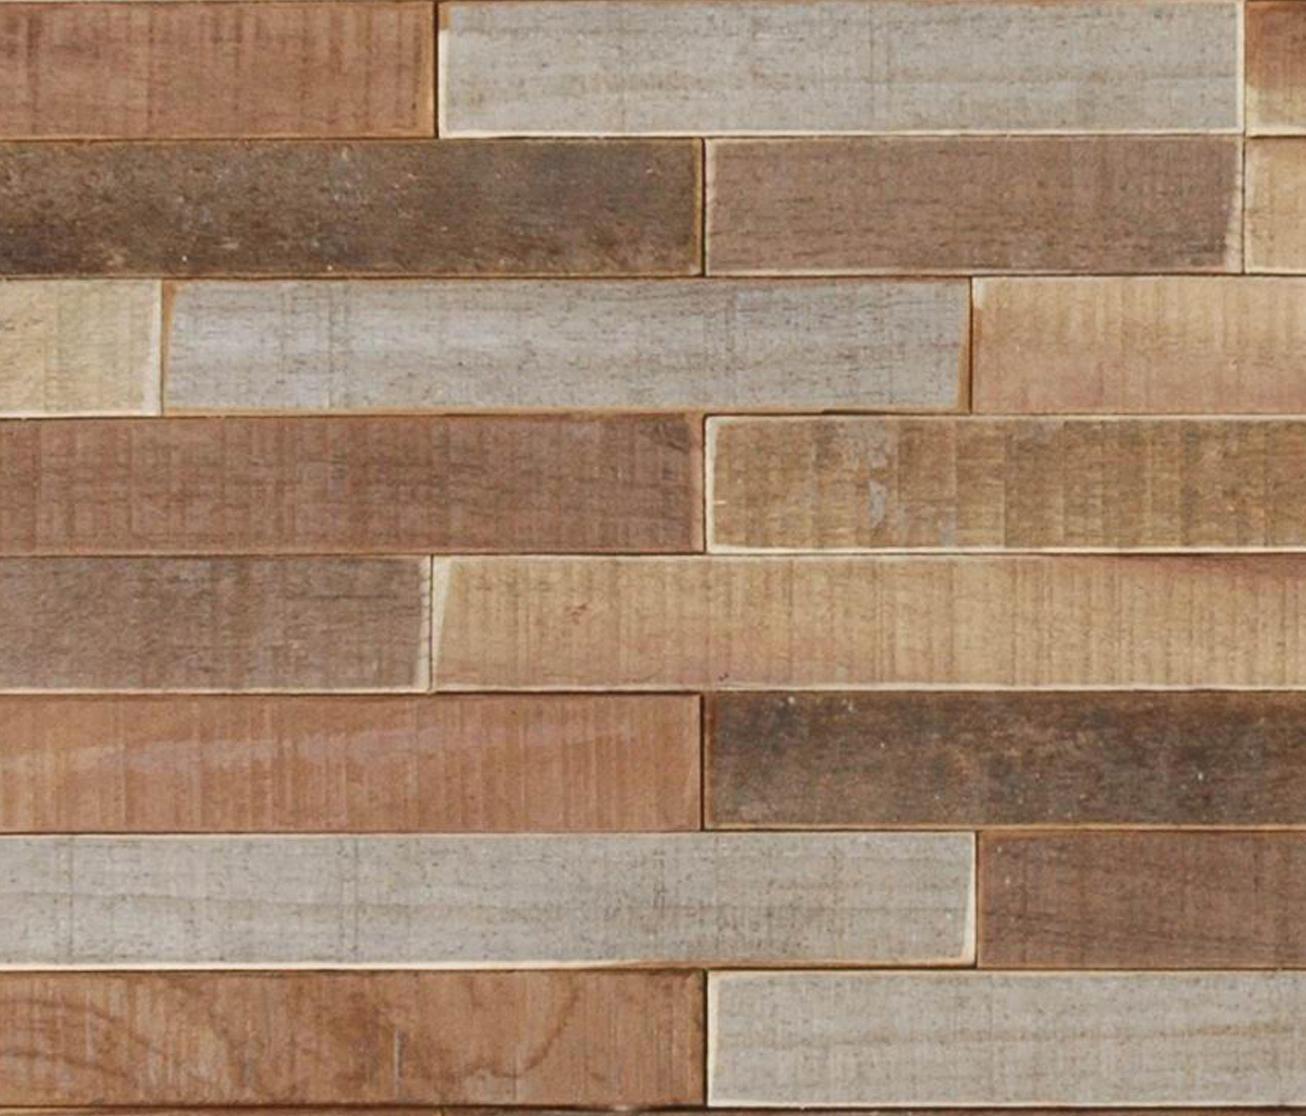 Cocomosaic Hv Envi Stick Tiles Wood Flooring From Cocomosaic